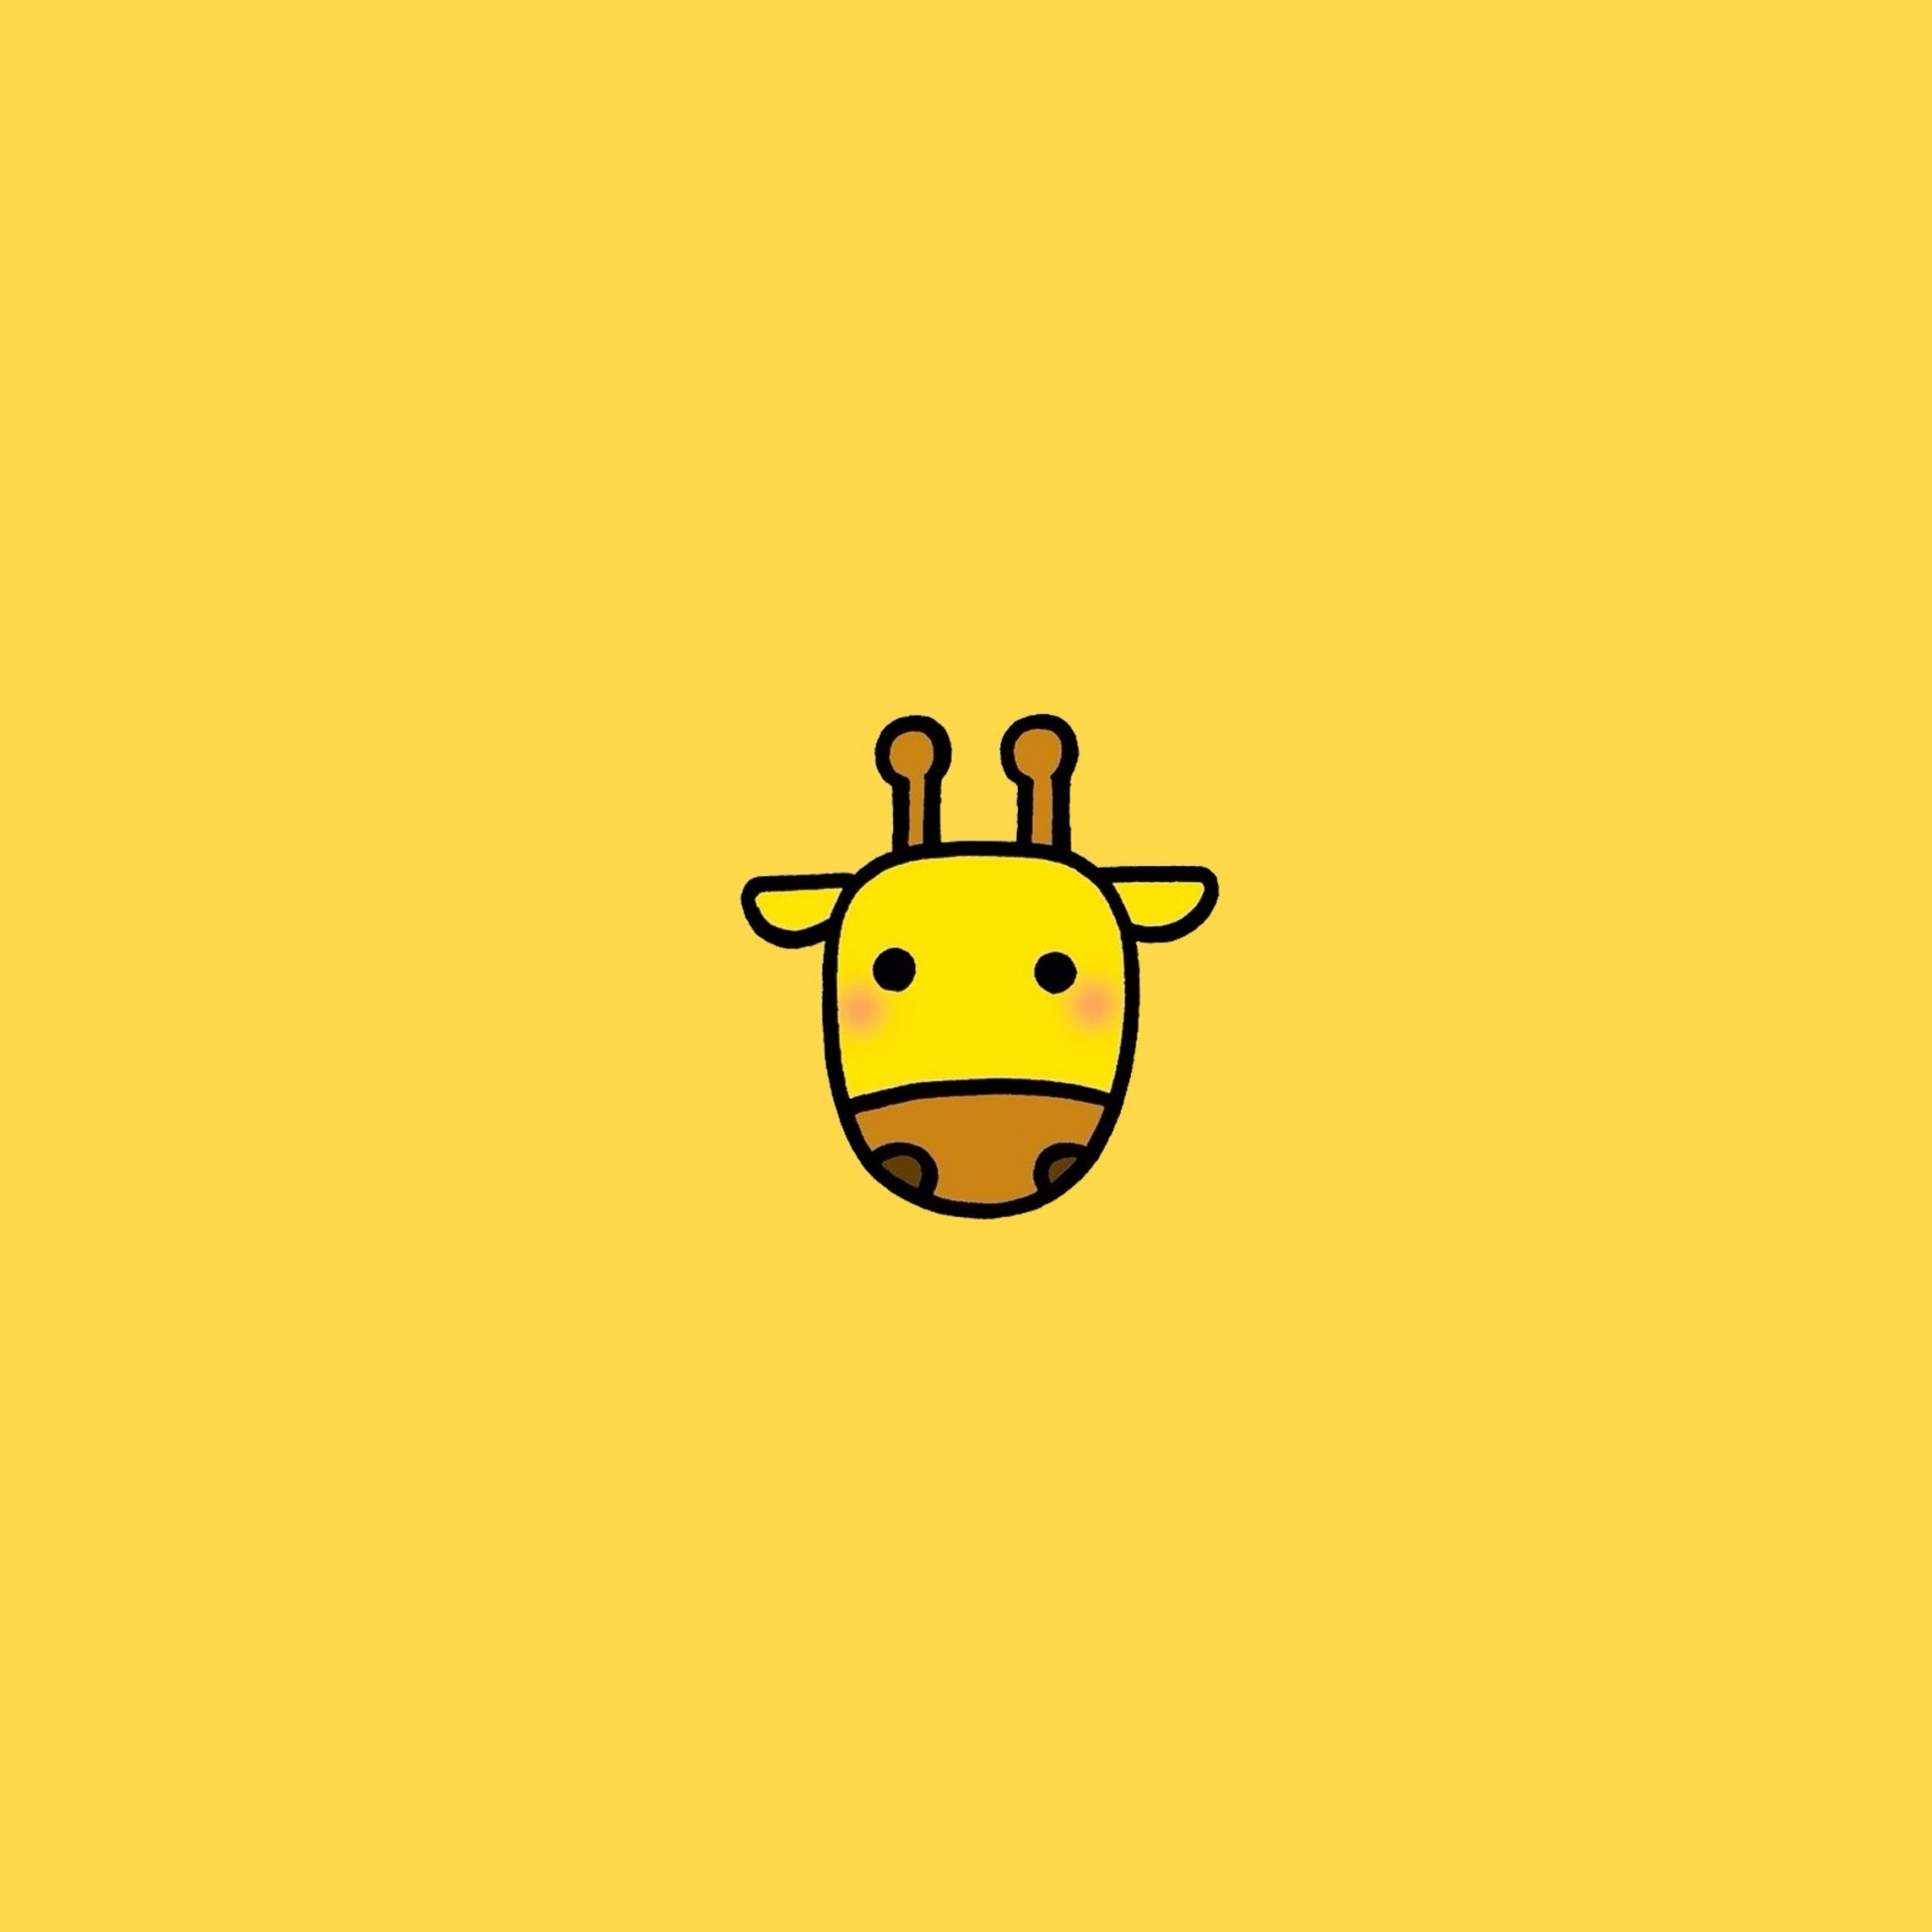 Giraffe wallpaper for all iPad from mobile9.com